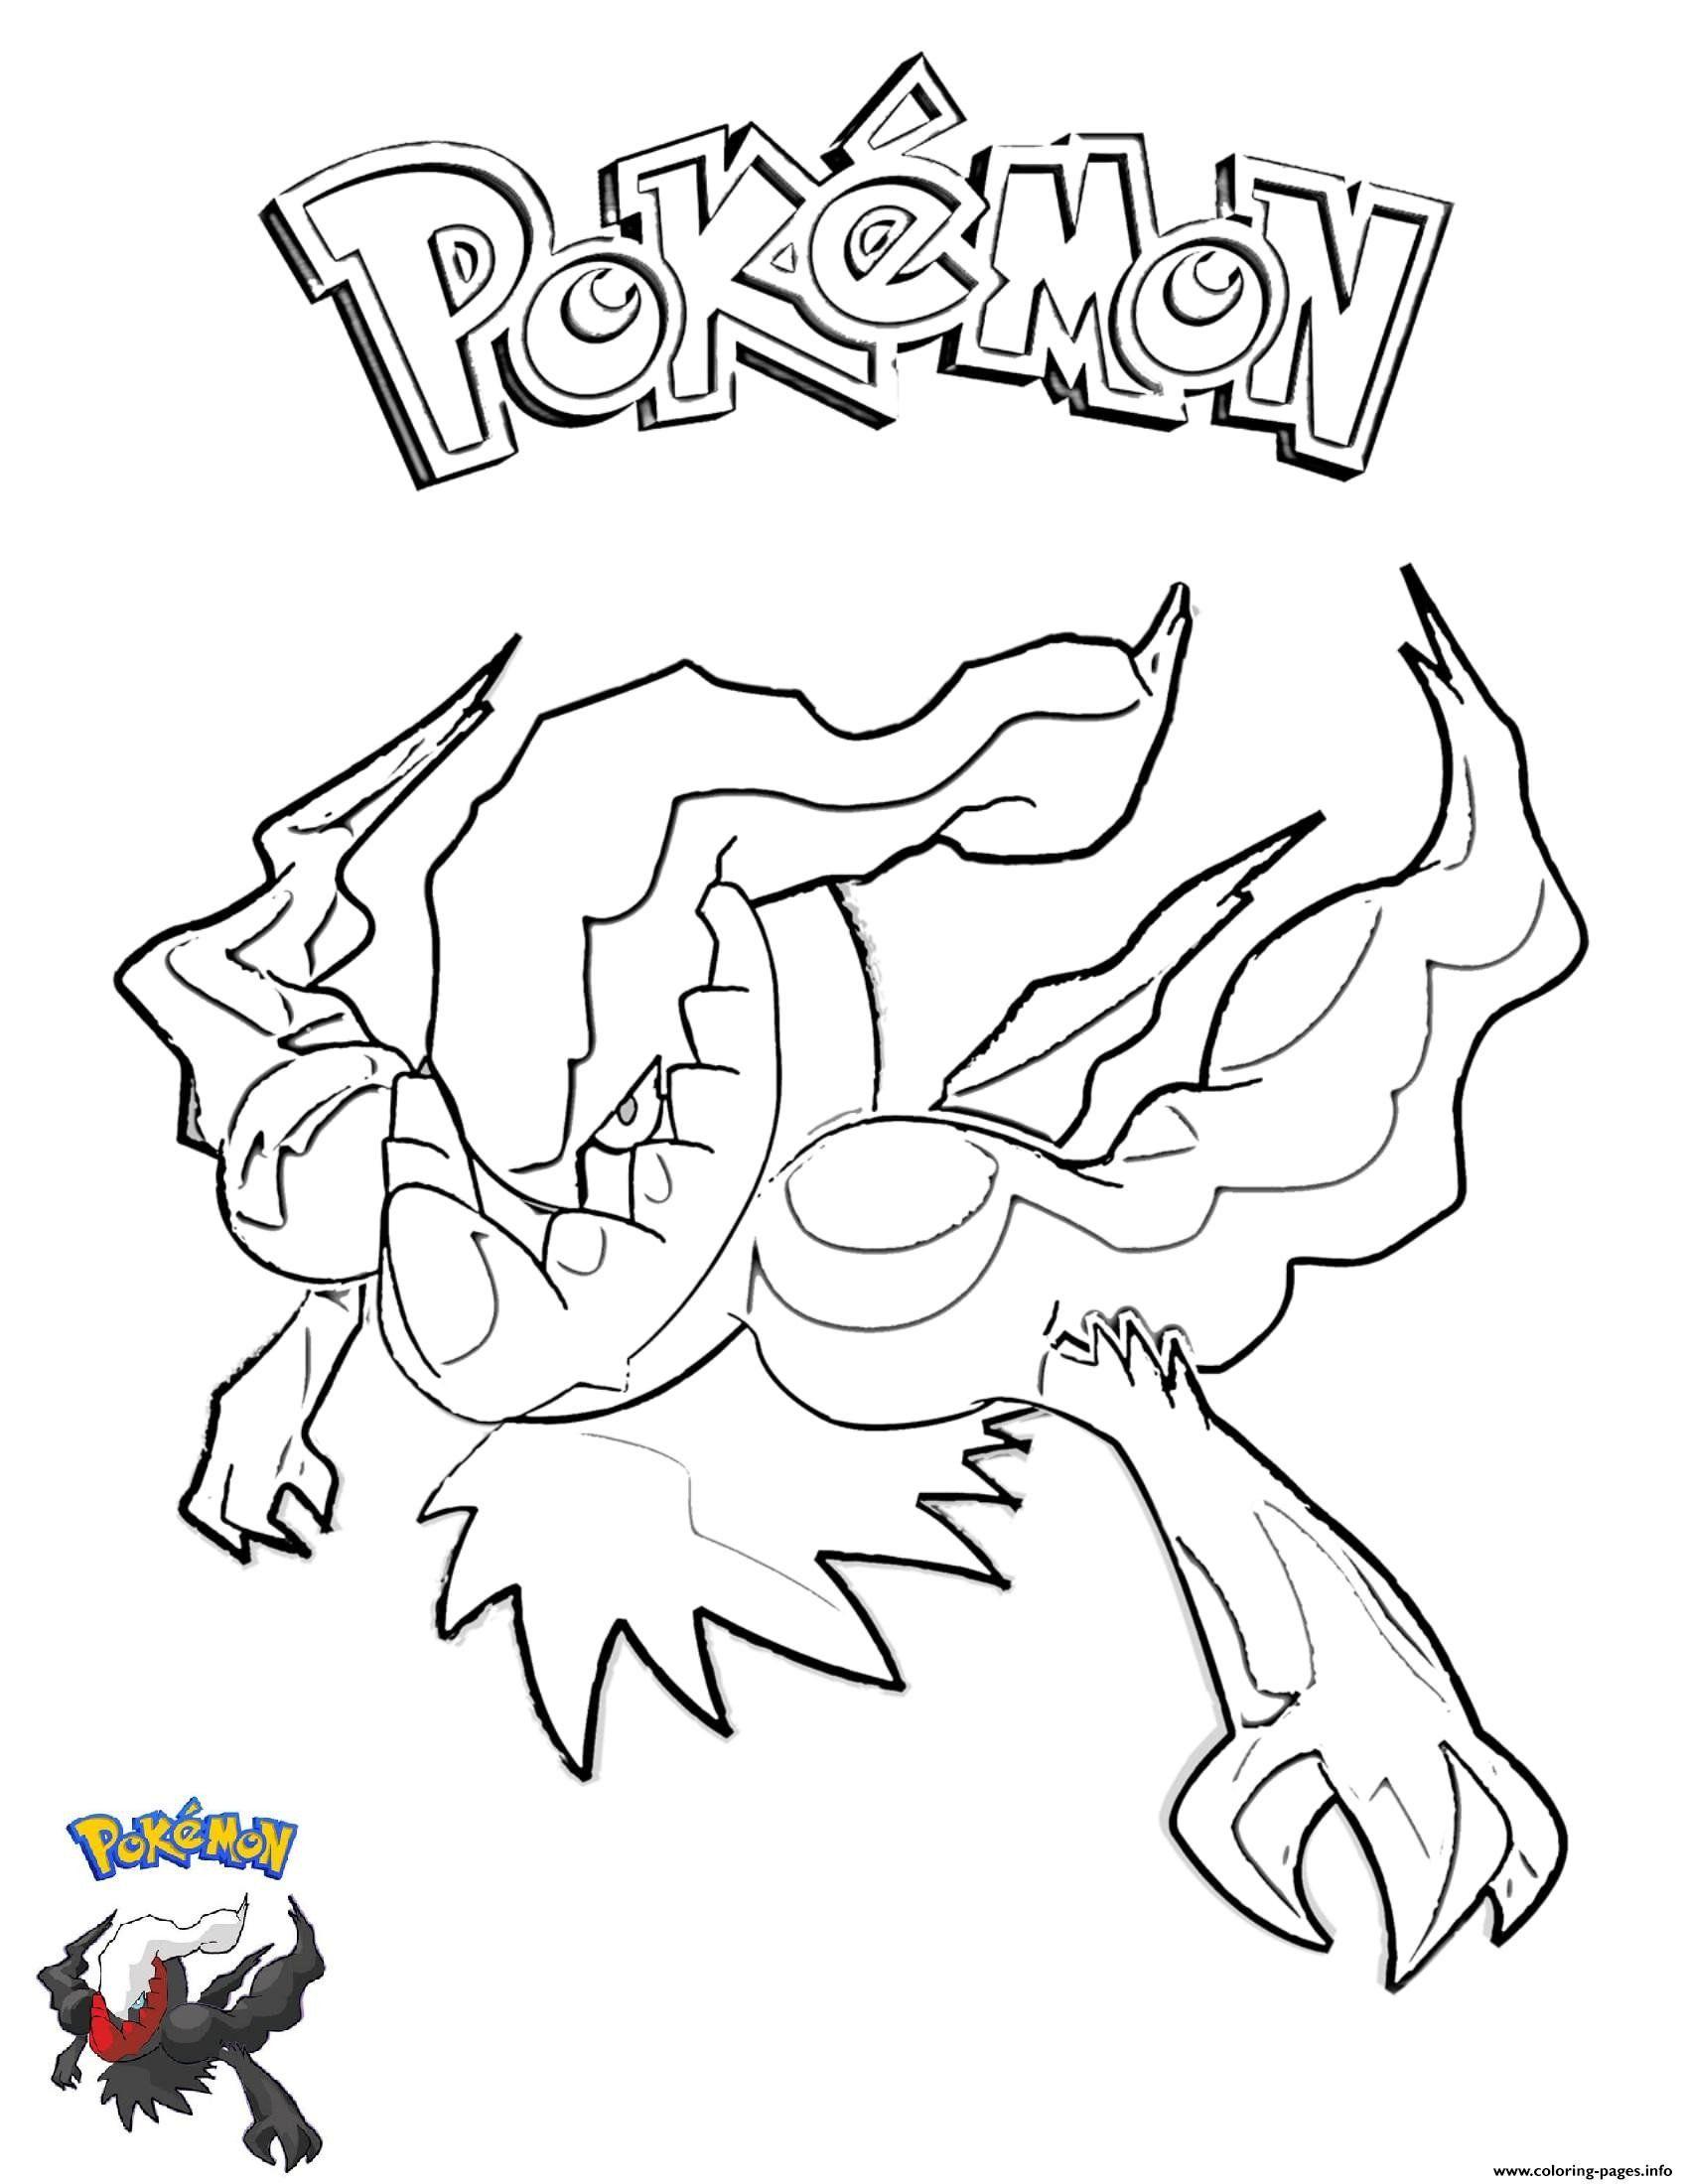 Legendary Pokemon Coloring Pages Darkrai Pokemon Coloring Pages Printable In 2020 Bear Coloring Pages Giraffe Coloring Pages Pokemon Coloring Pages